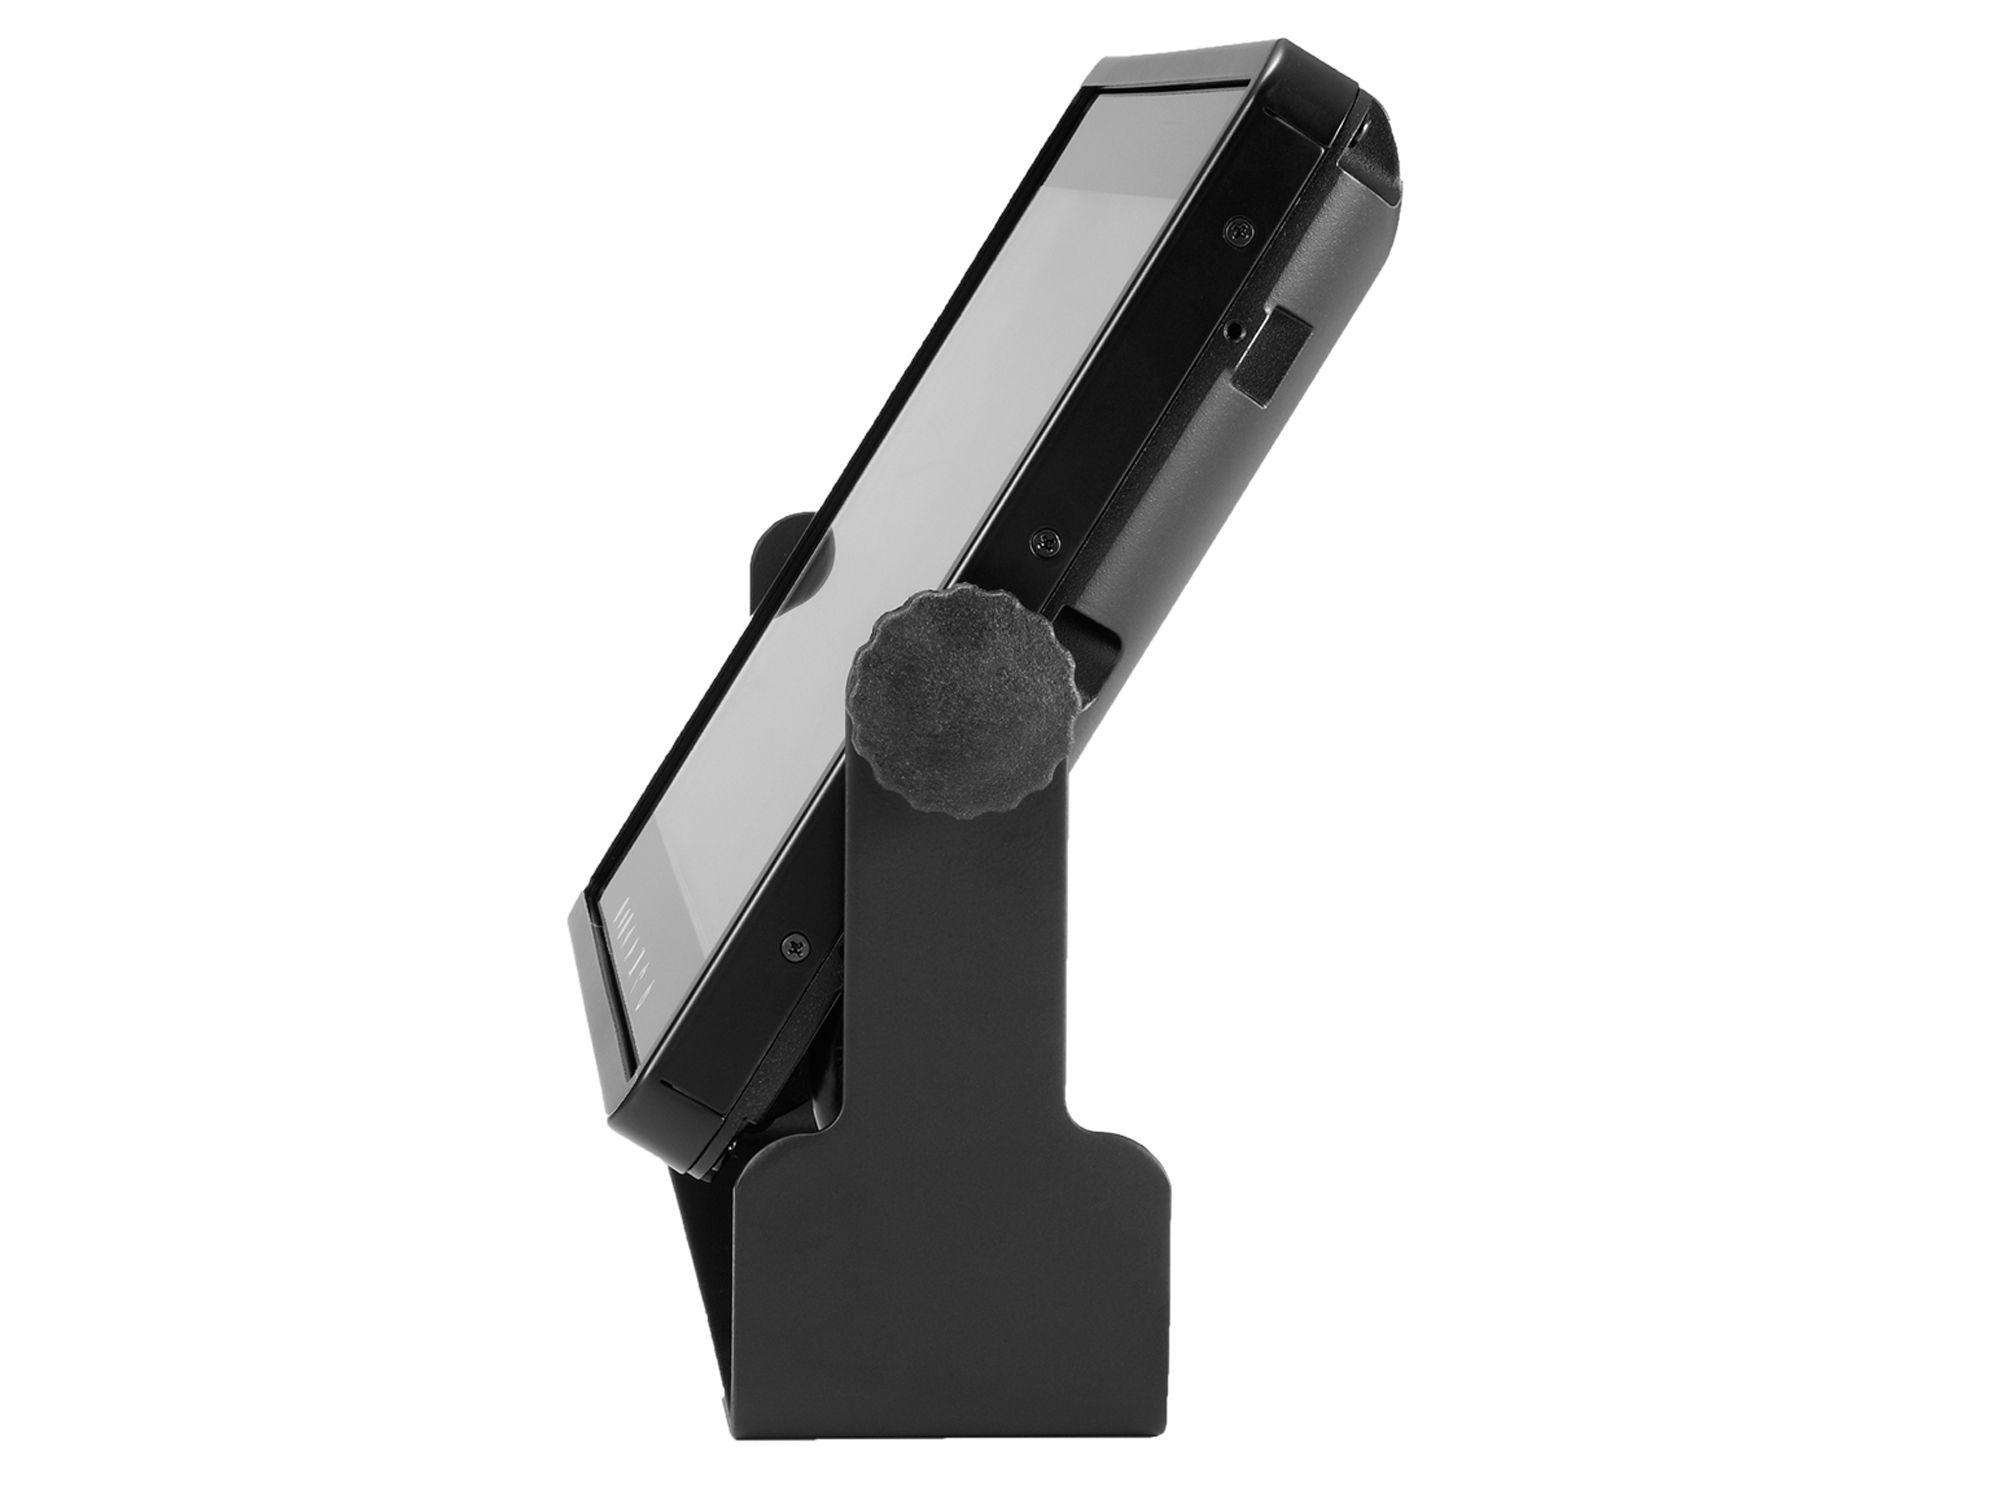 Pin On 10 Hdmi Vga Dvi Sdi All Weather Rugged Monitors